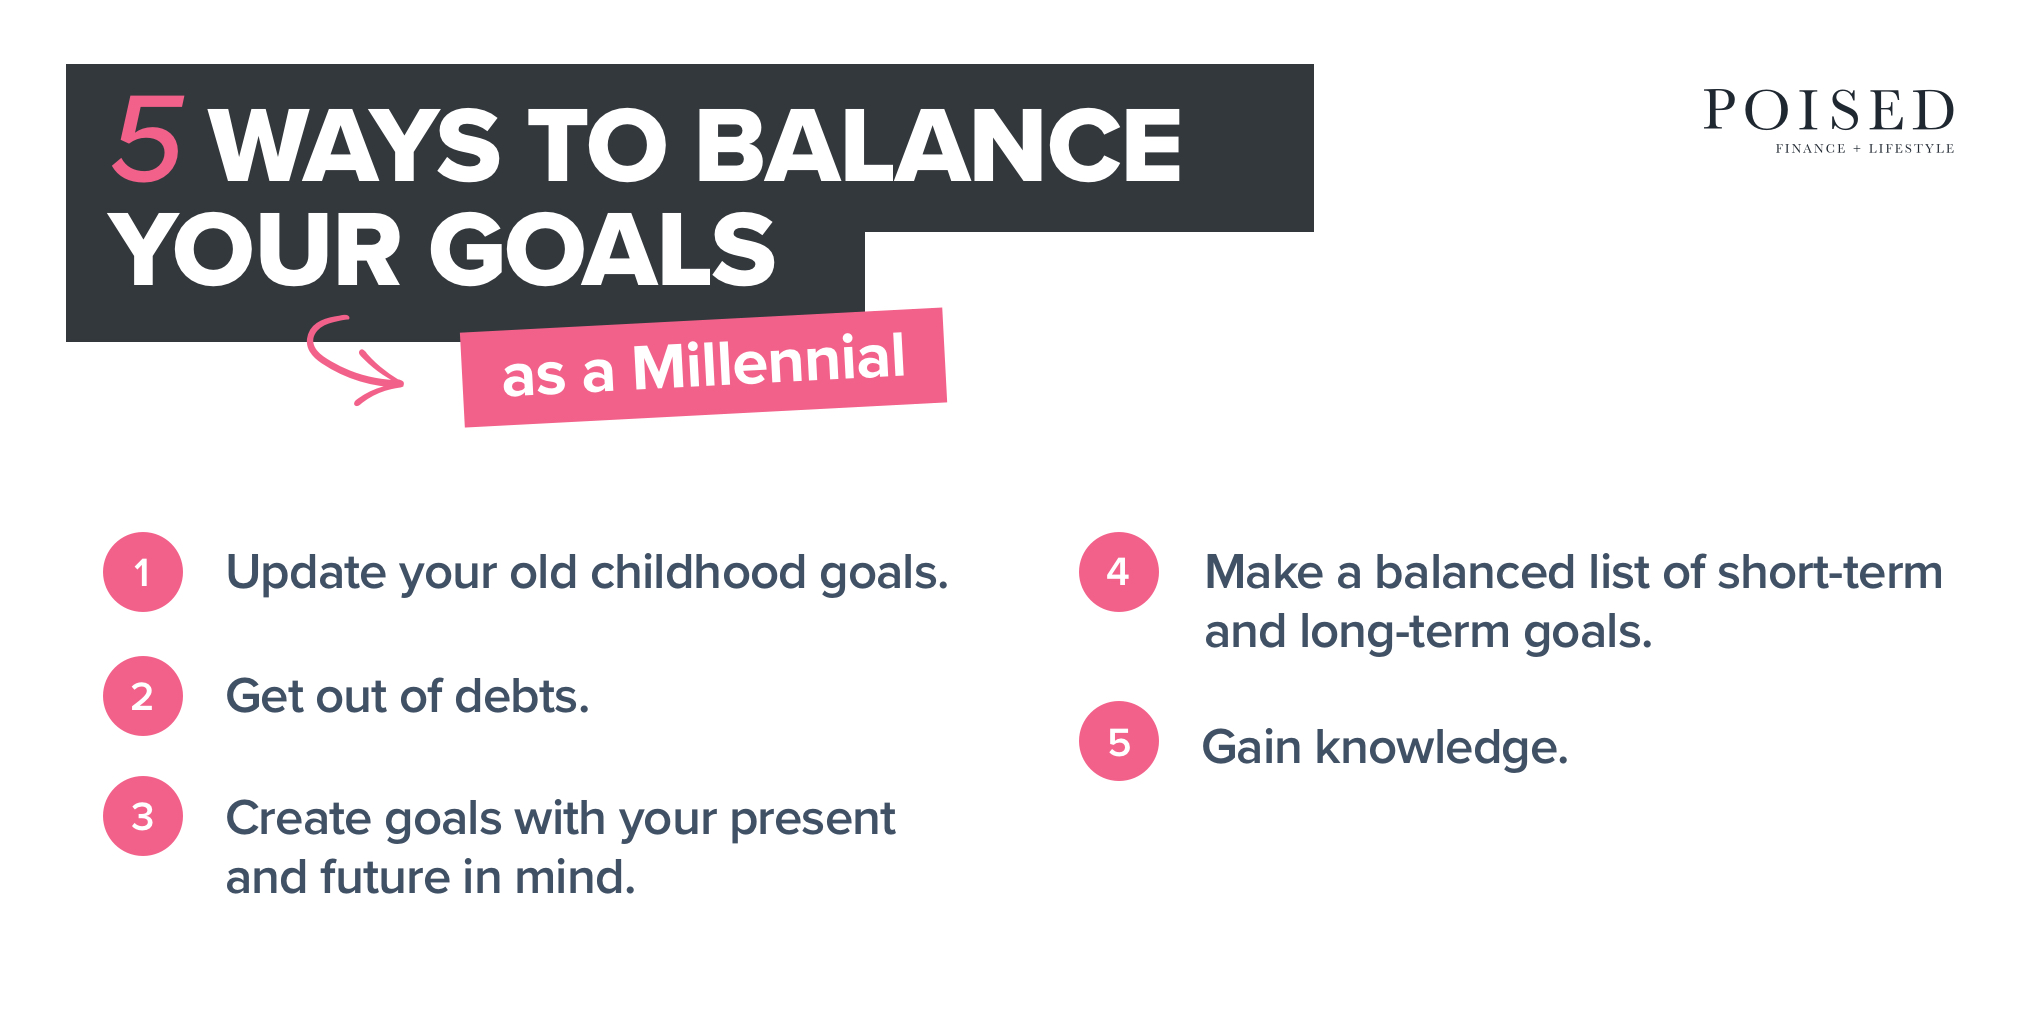 5 ways to balance your goals as a millennial